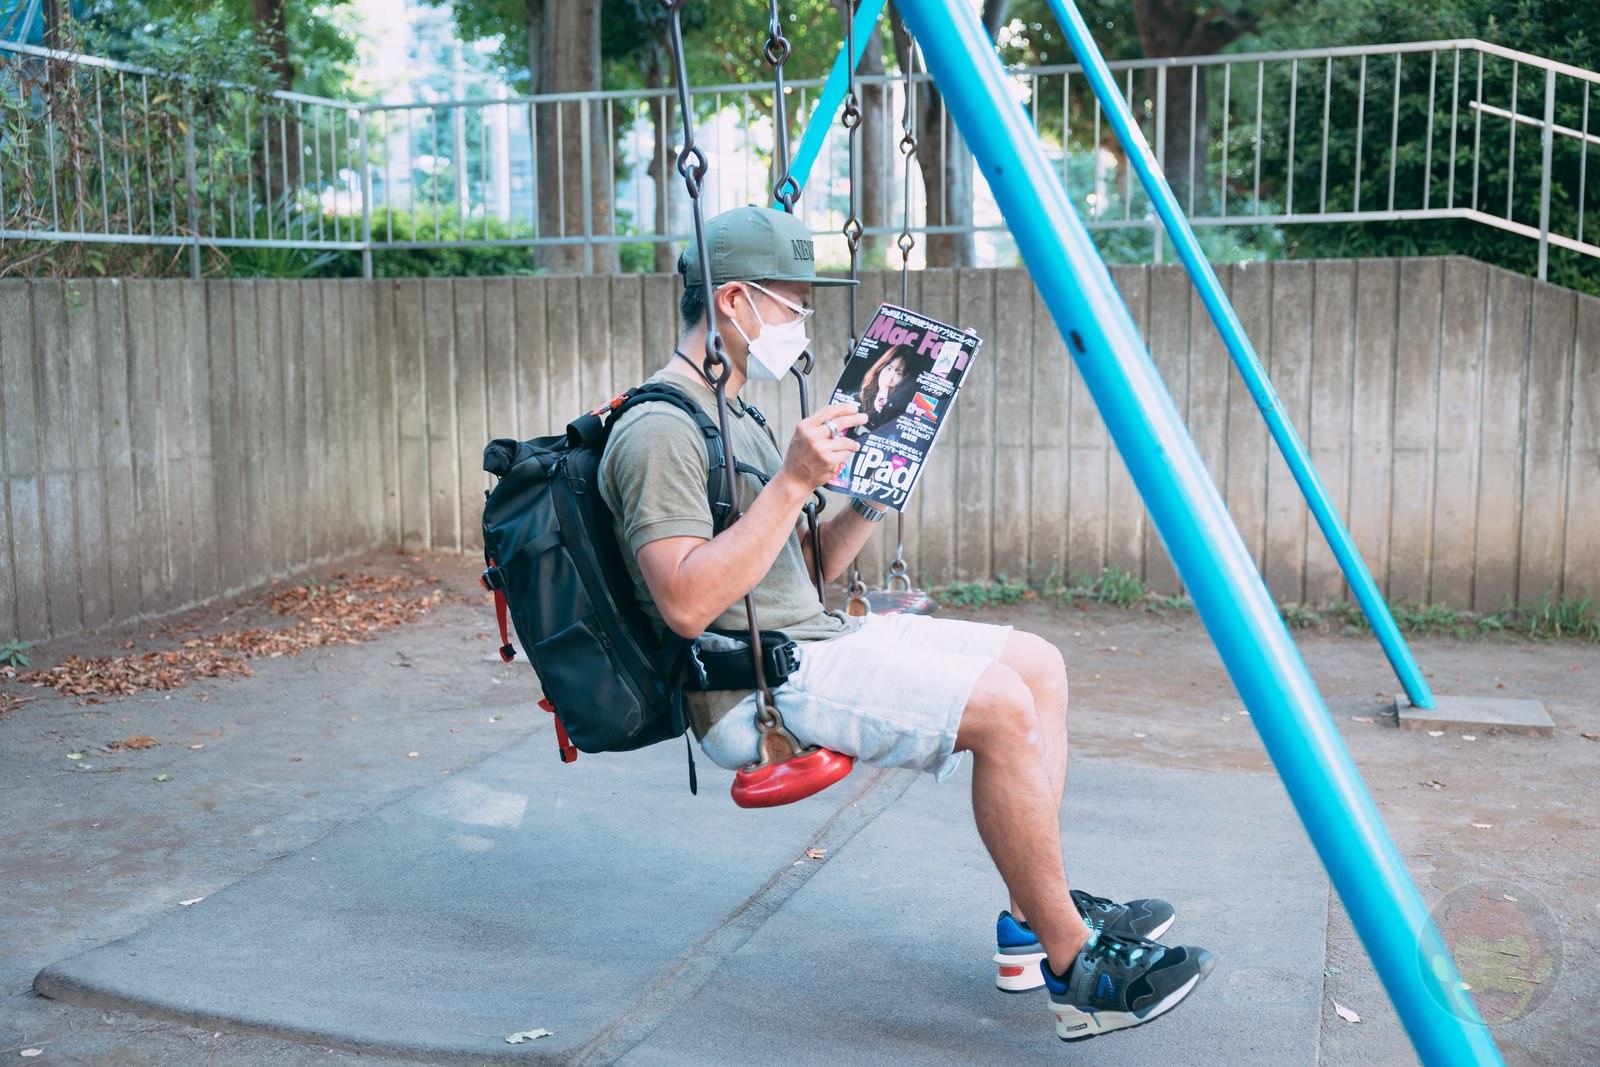 Lots of people are reading MacFan Sep2021 09